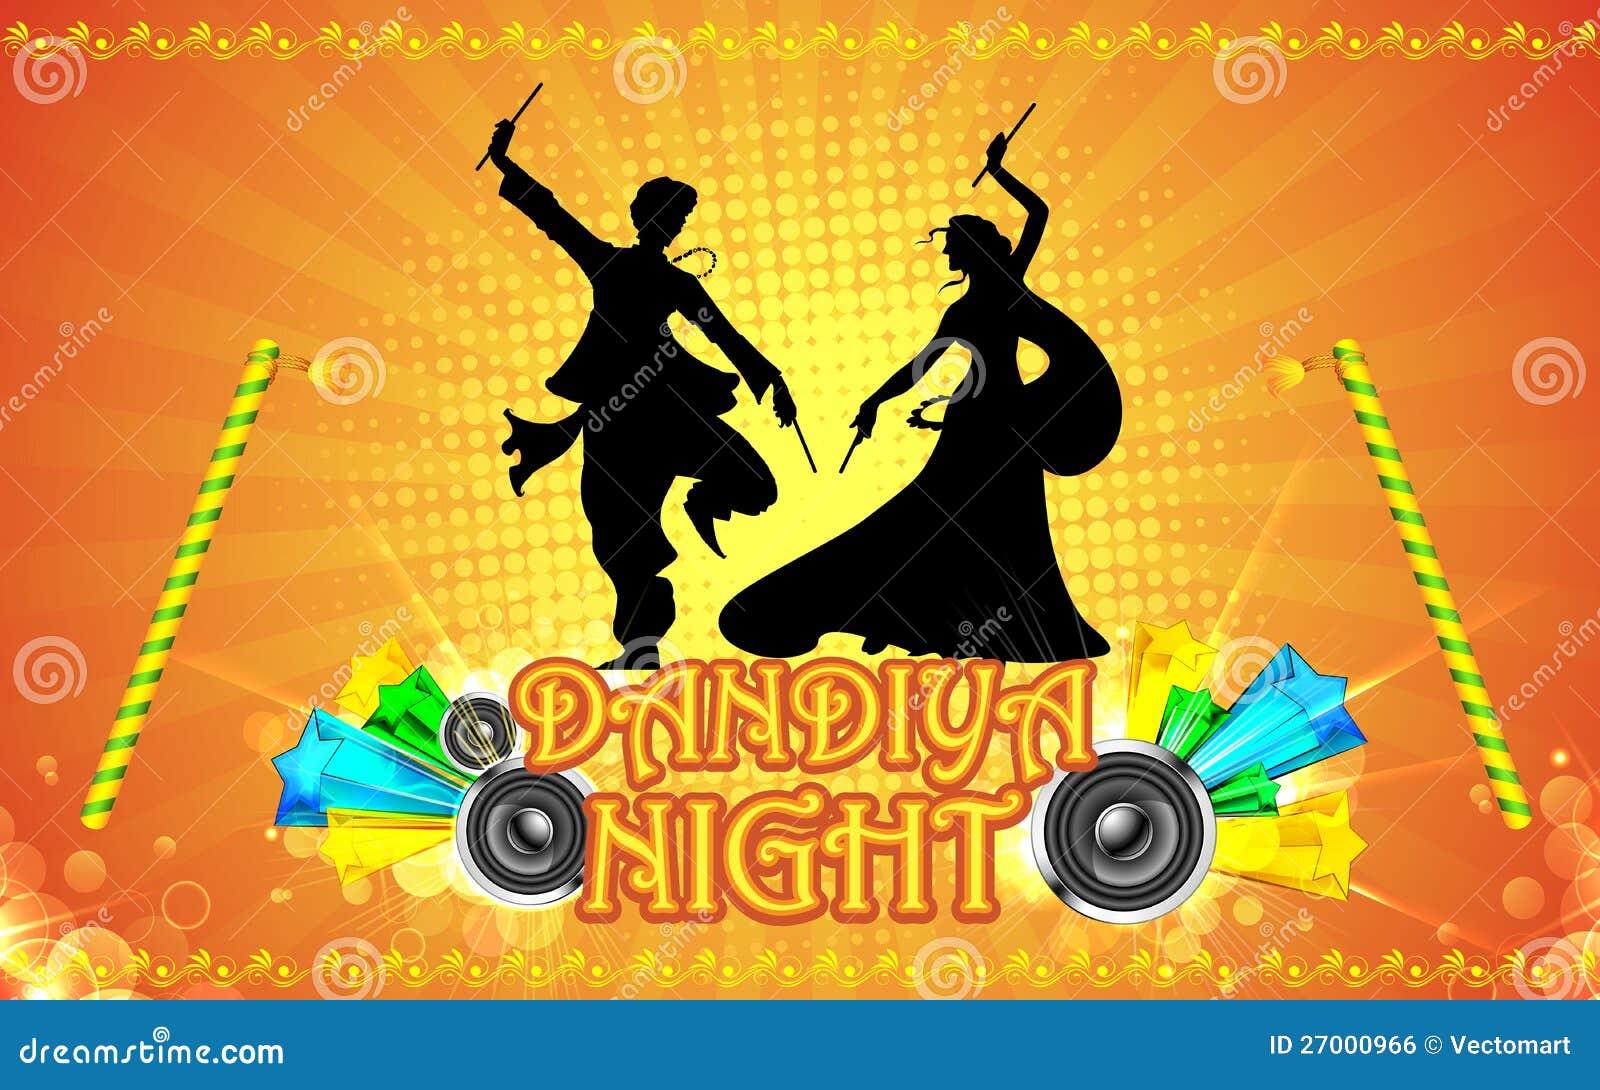 Dandiya Night Royalty Free Stock Image Image 27000966